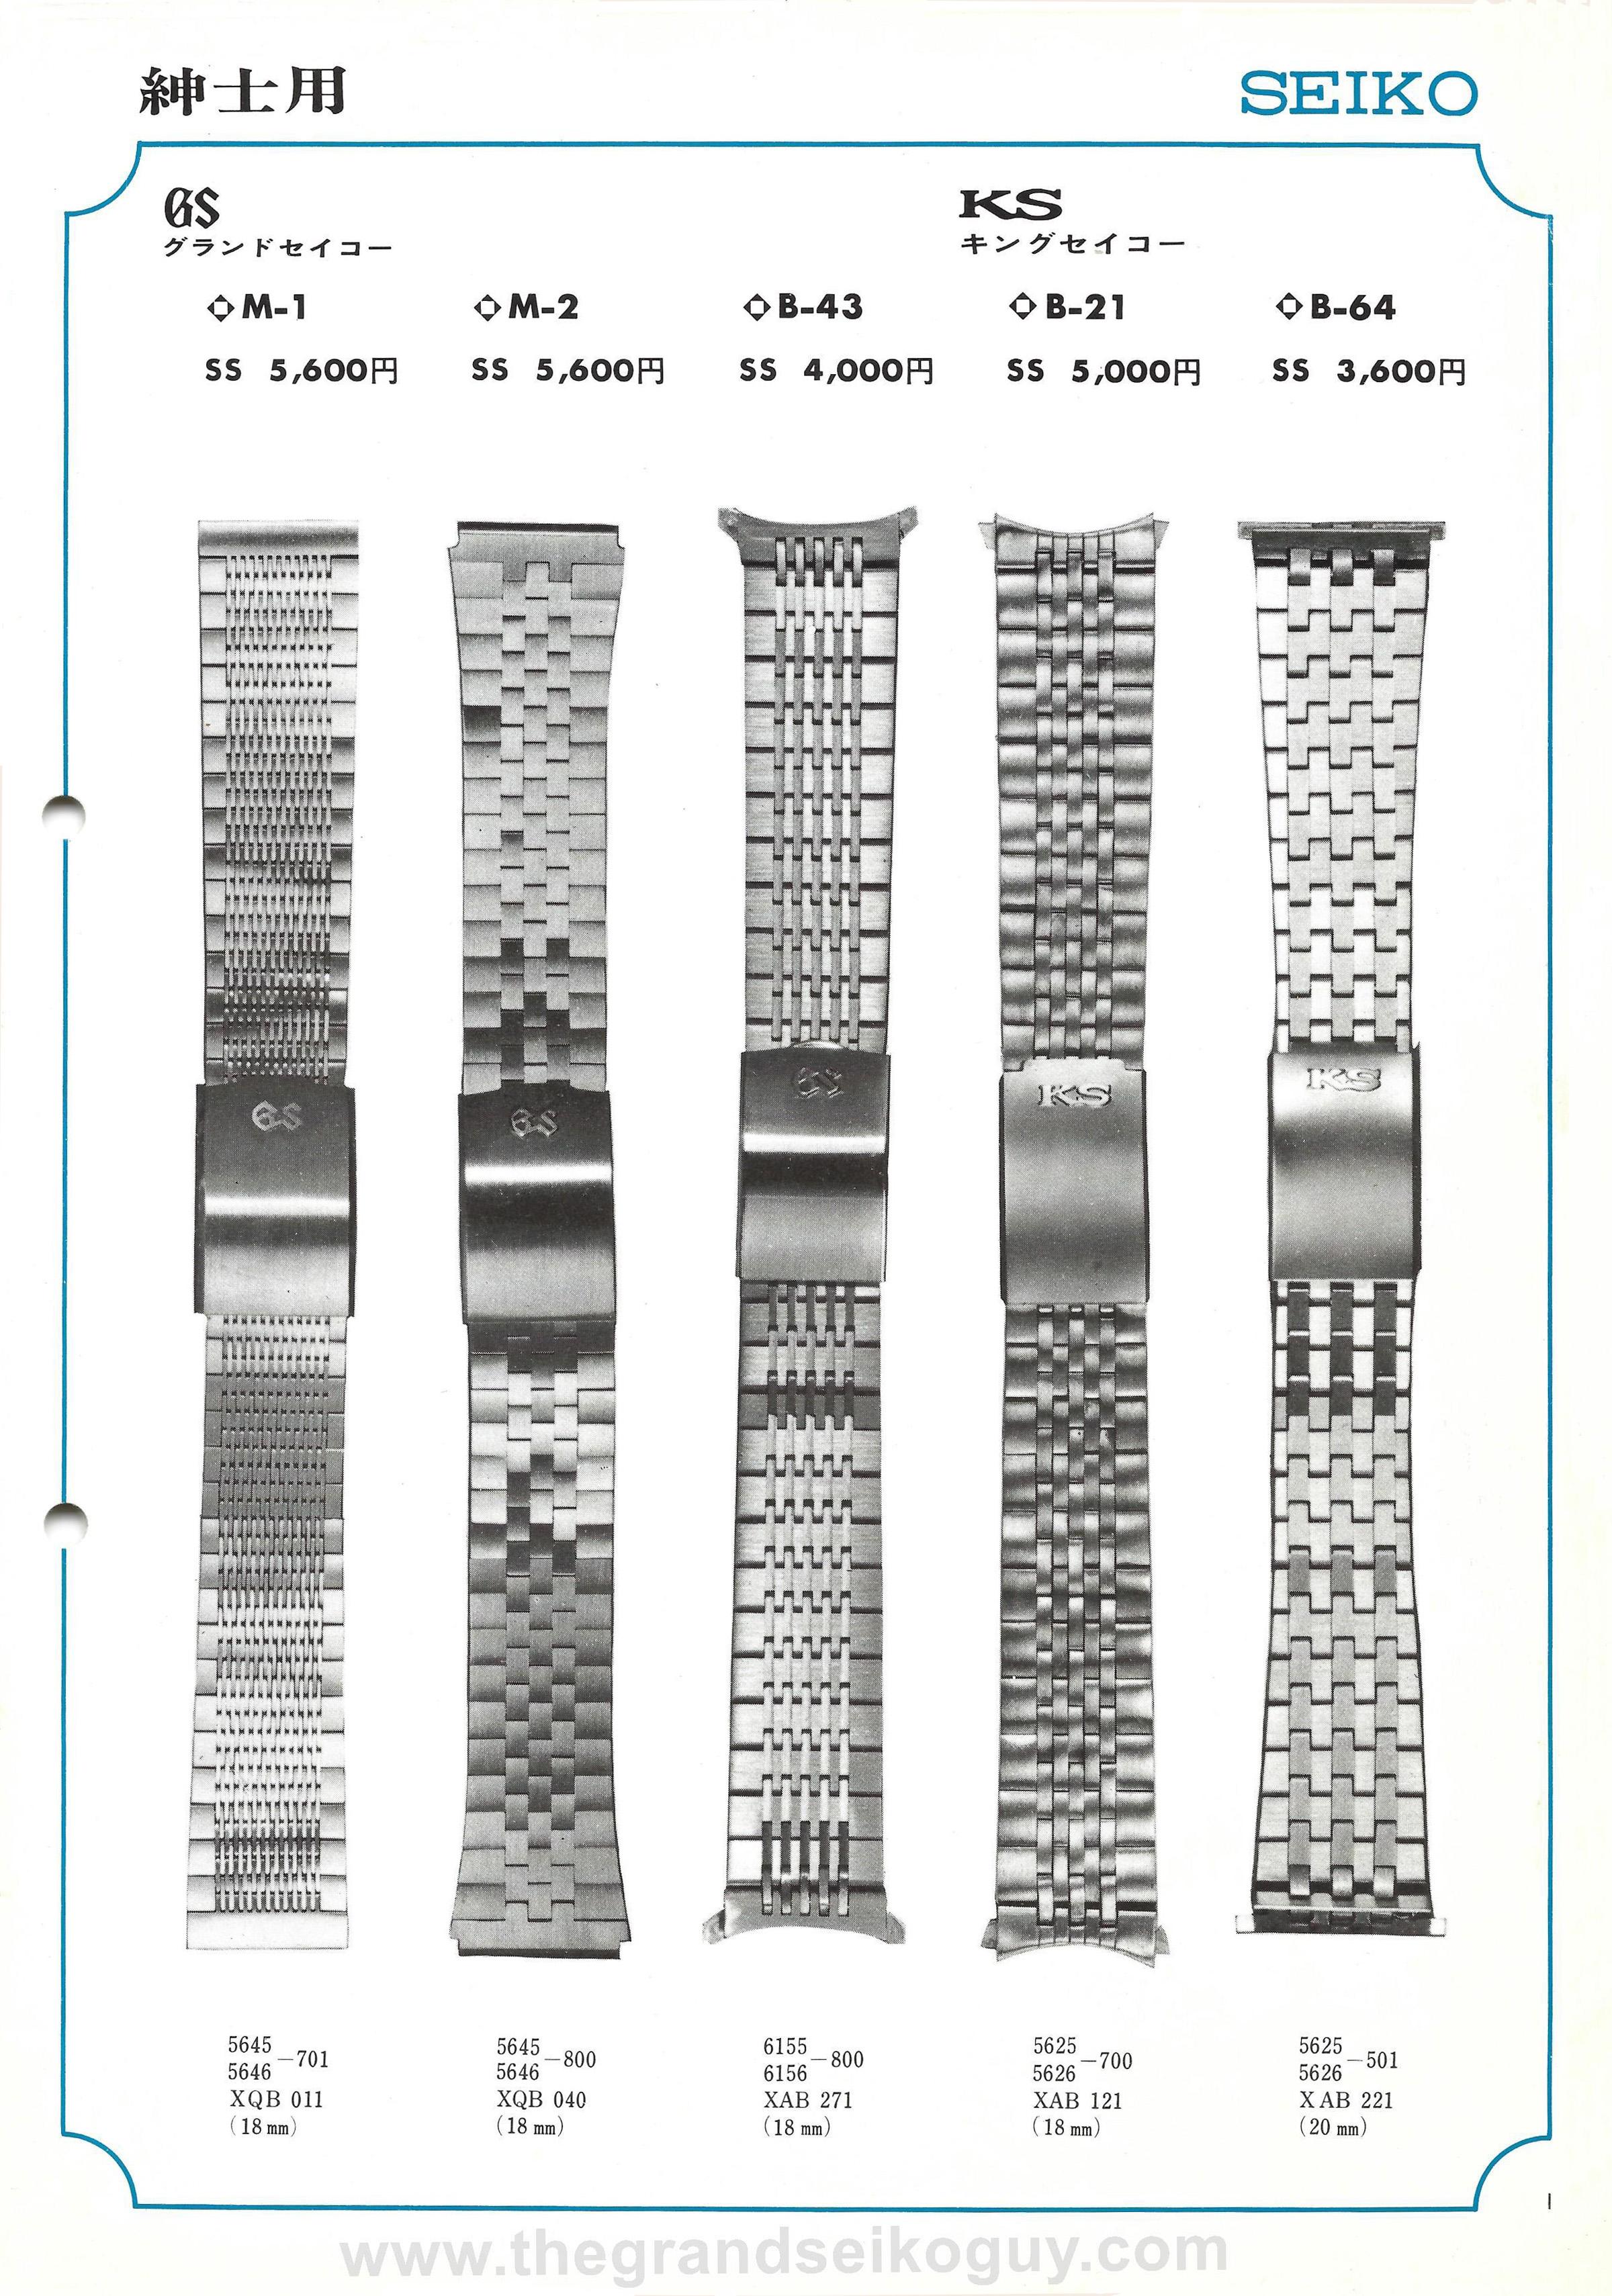 1972 Watchband Catalog